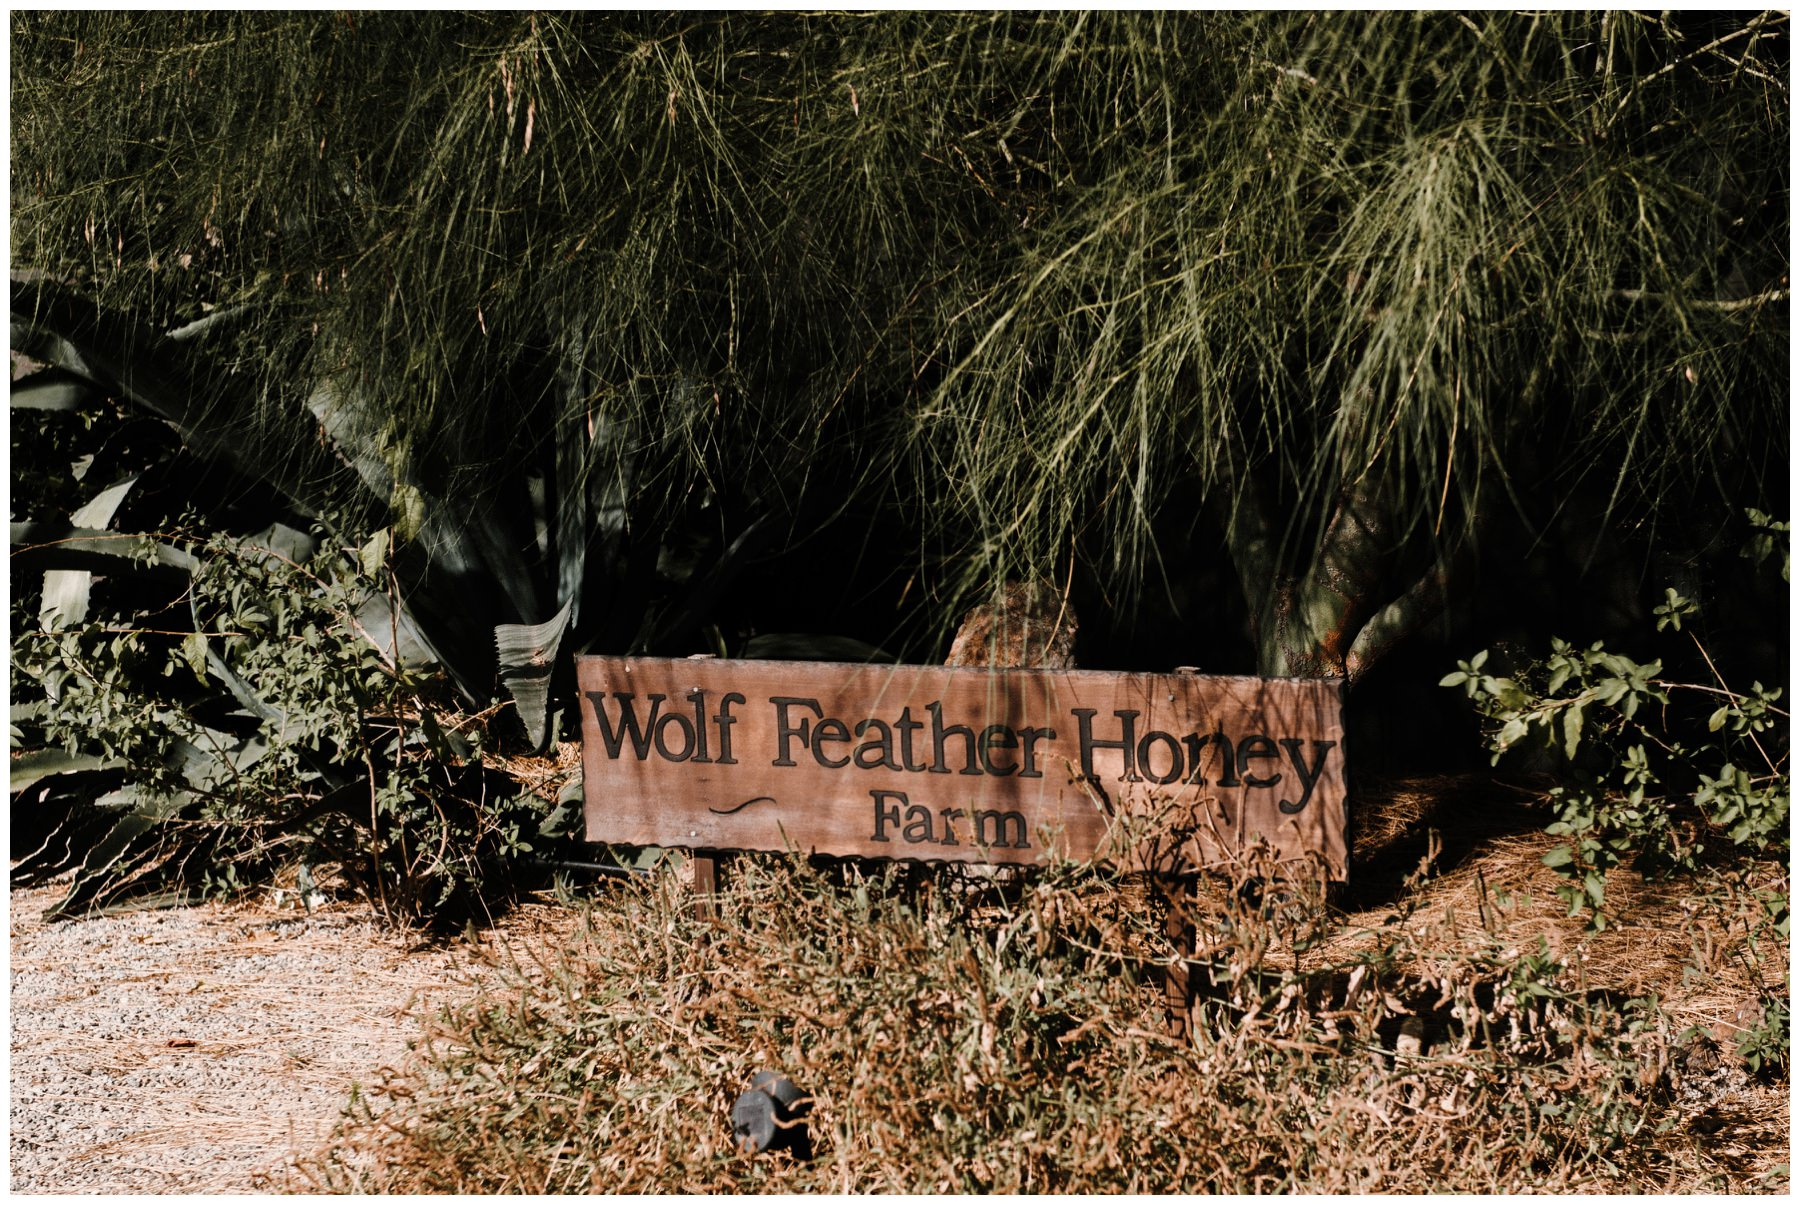 Temecula_Wedding_photographers_Wolf_Feather_Honey_0033.jpg